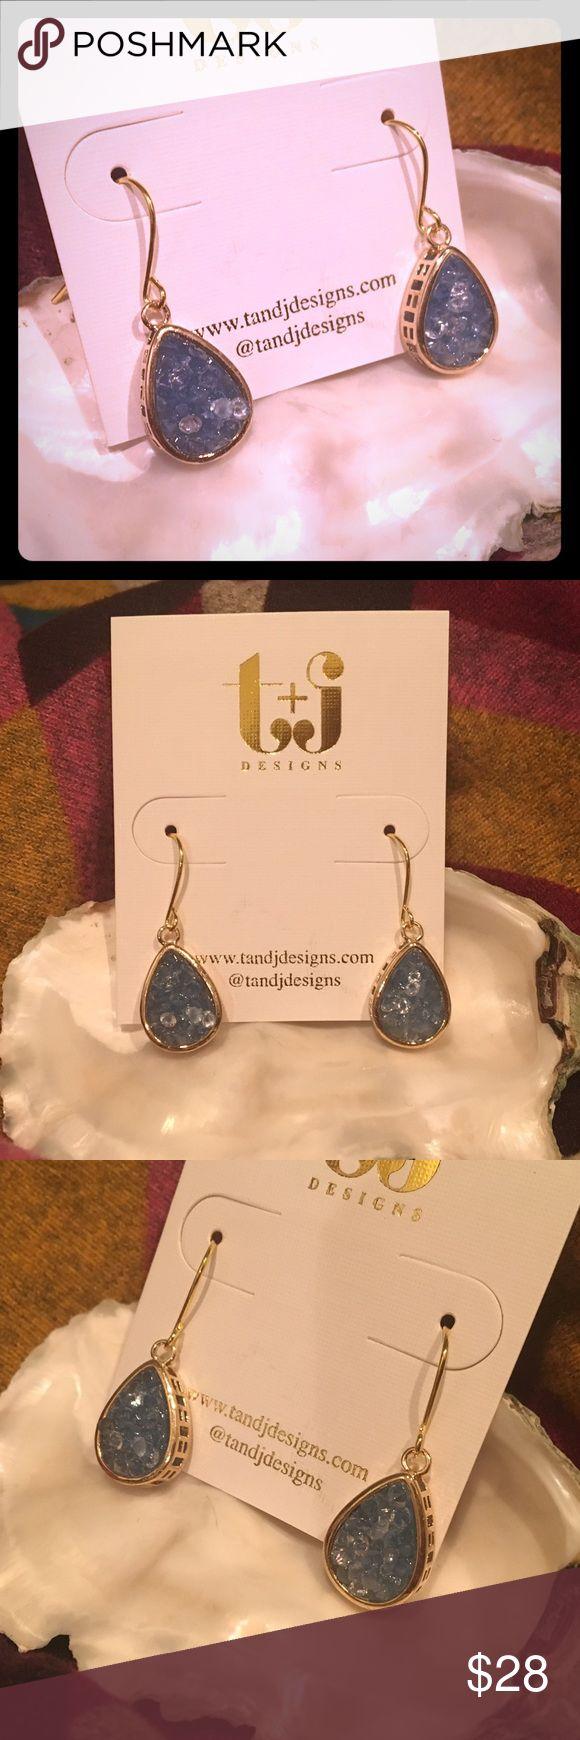 "HP💙 Aqua Rock Crystal Teardrop Earrings 18k Gold 💙💙💙 HOST PICK for 12-6-16 #POSHLOVEFEST TOTAL TRENDSETTER PARTY   💙💙💙  Aqua blue genuine rock crystal Druzy earrings. 18k gold-plated metal. NO nickel or lead in the metal. The teardrop measures just over 1/2"" long; earring measures just over 1"" long. The first three photos show the EXACT pair of earrings you will receive. 💙💙💙 (#2) T&J Designs Jewelry Earrings"